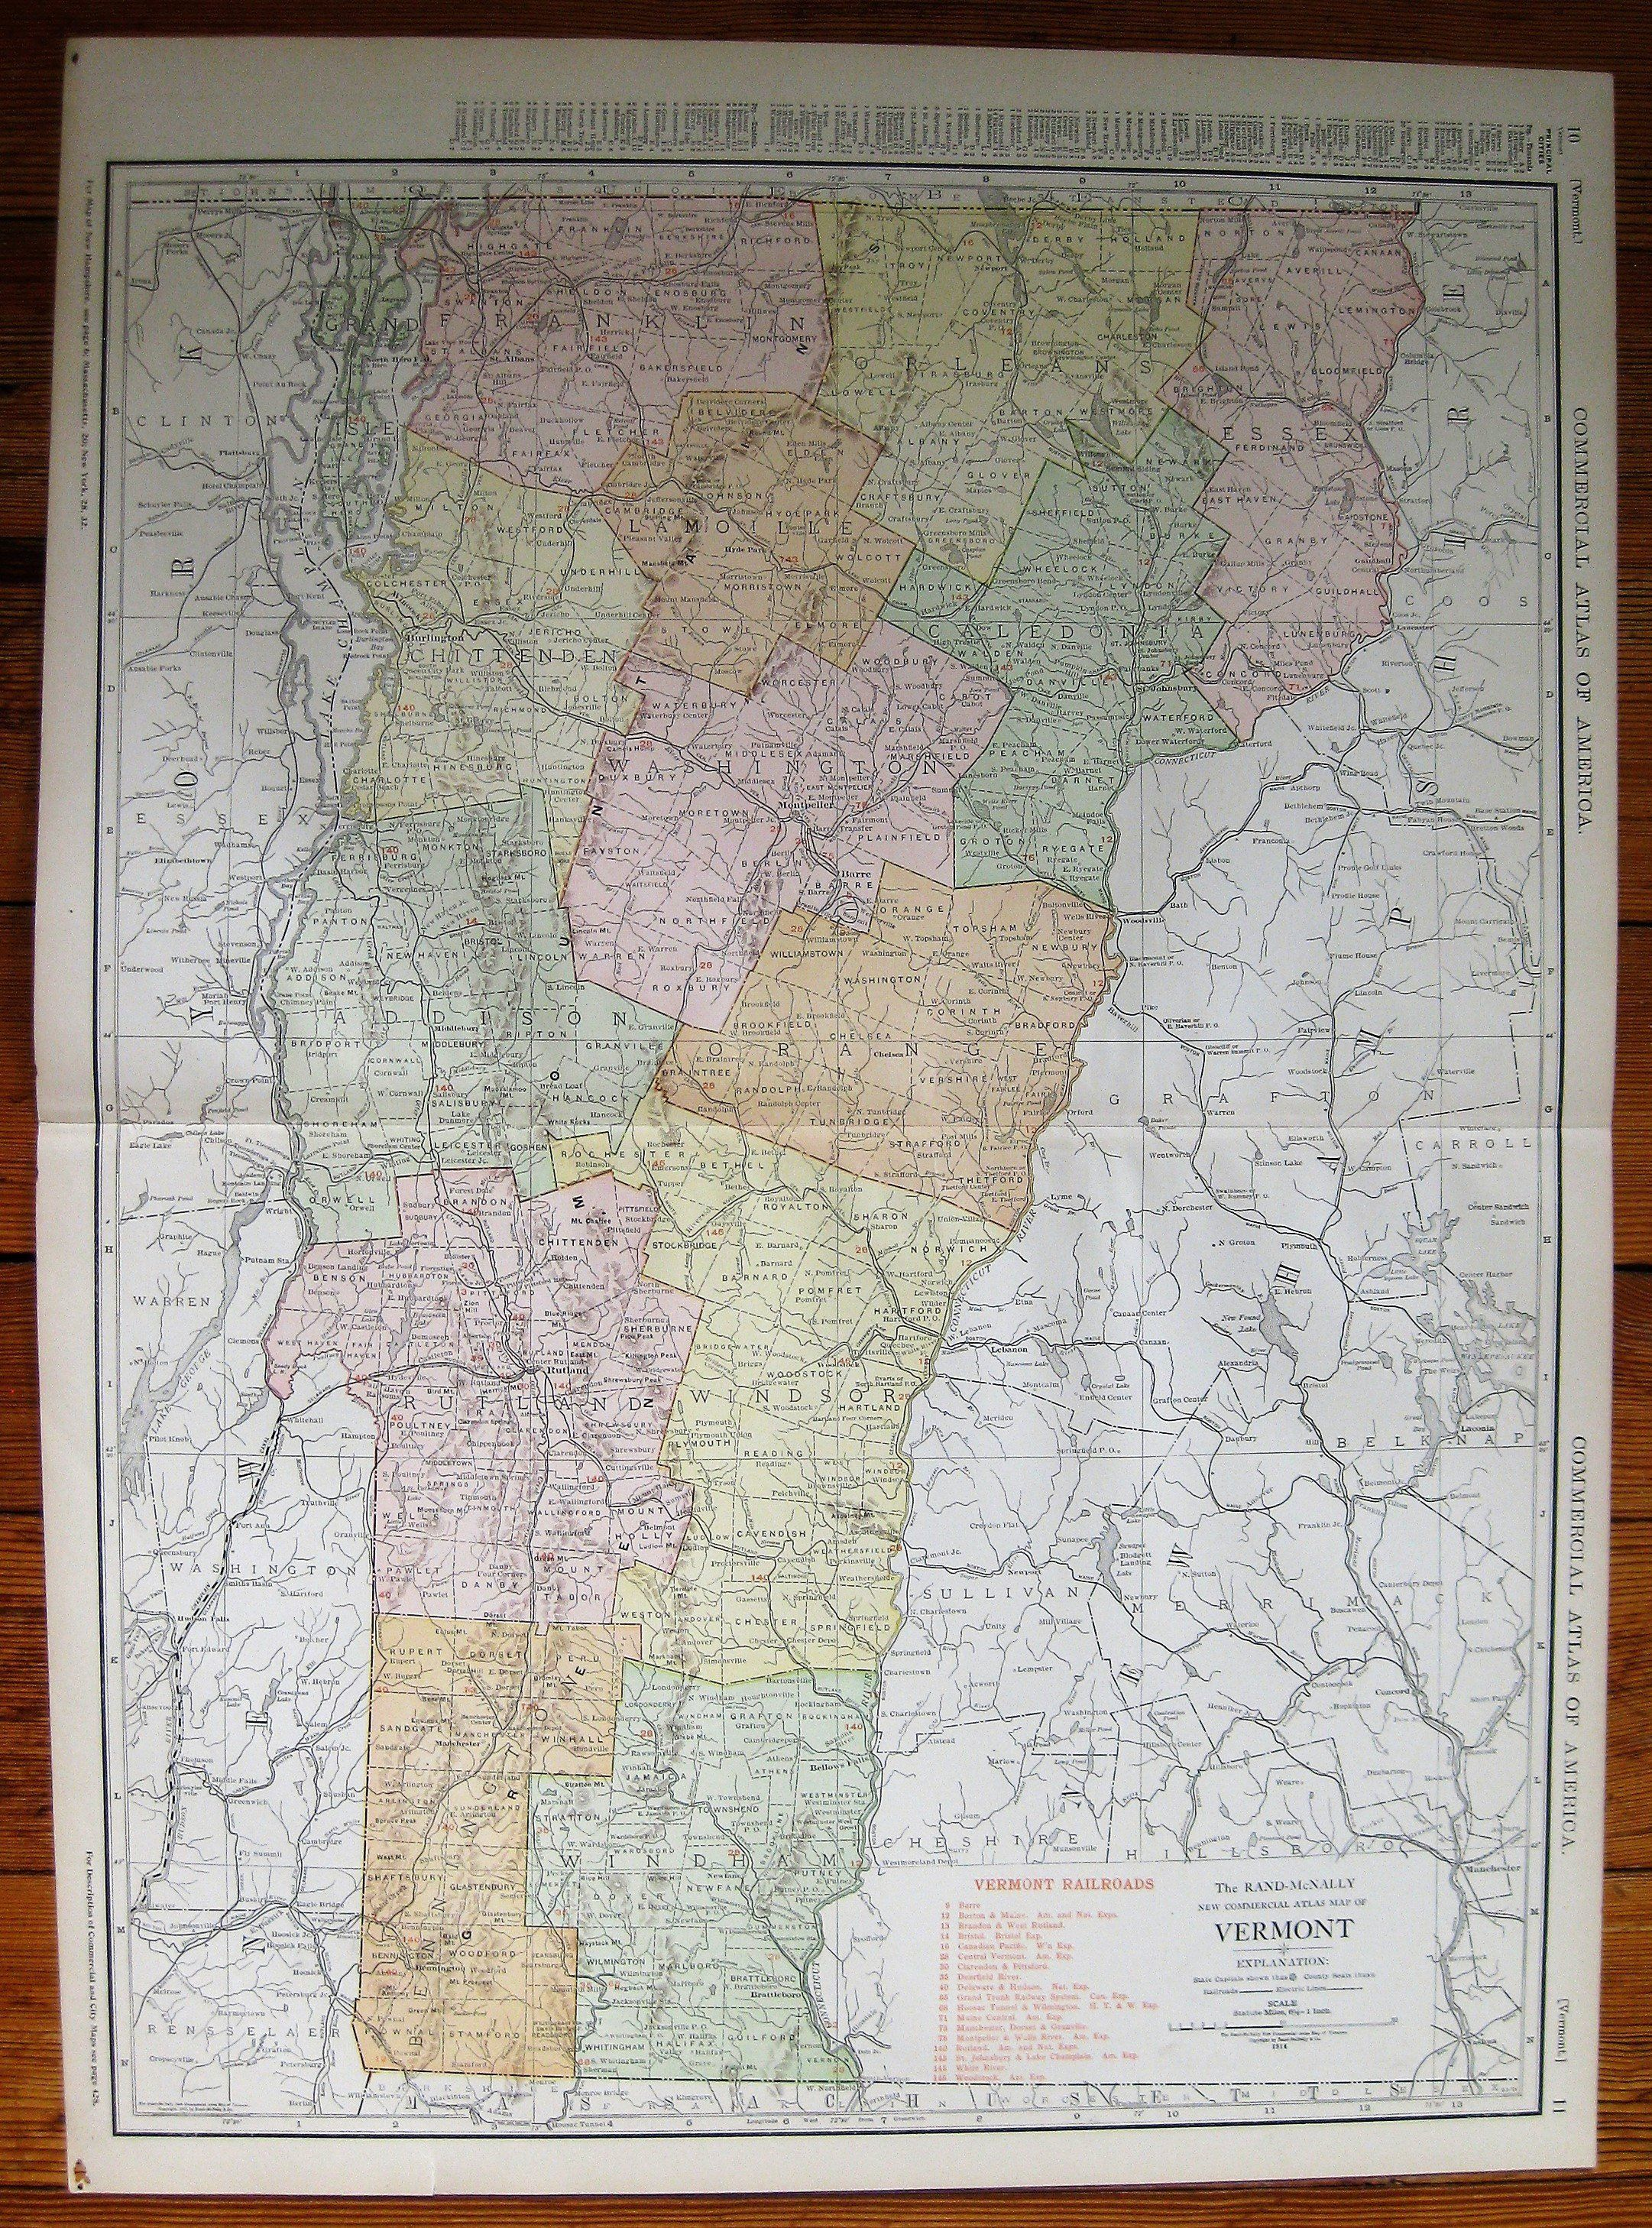 MAP ANTIQUE MILITARY 1777 BATTLE HUBBARDTON VERMONT REPLICA POSTER PRINT PAM2048